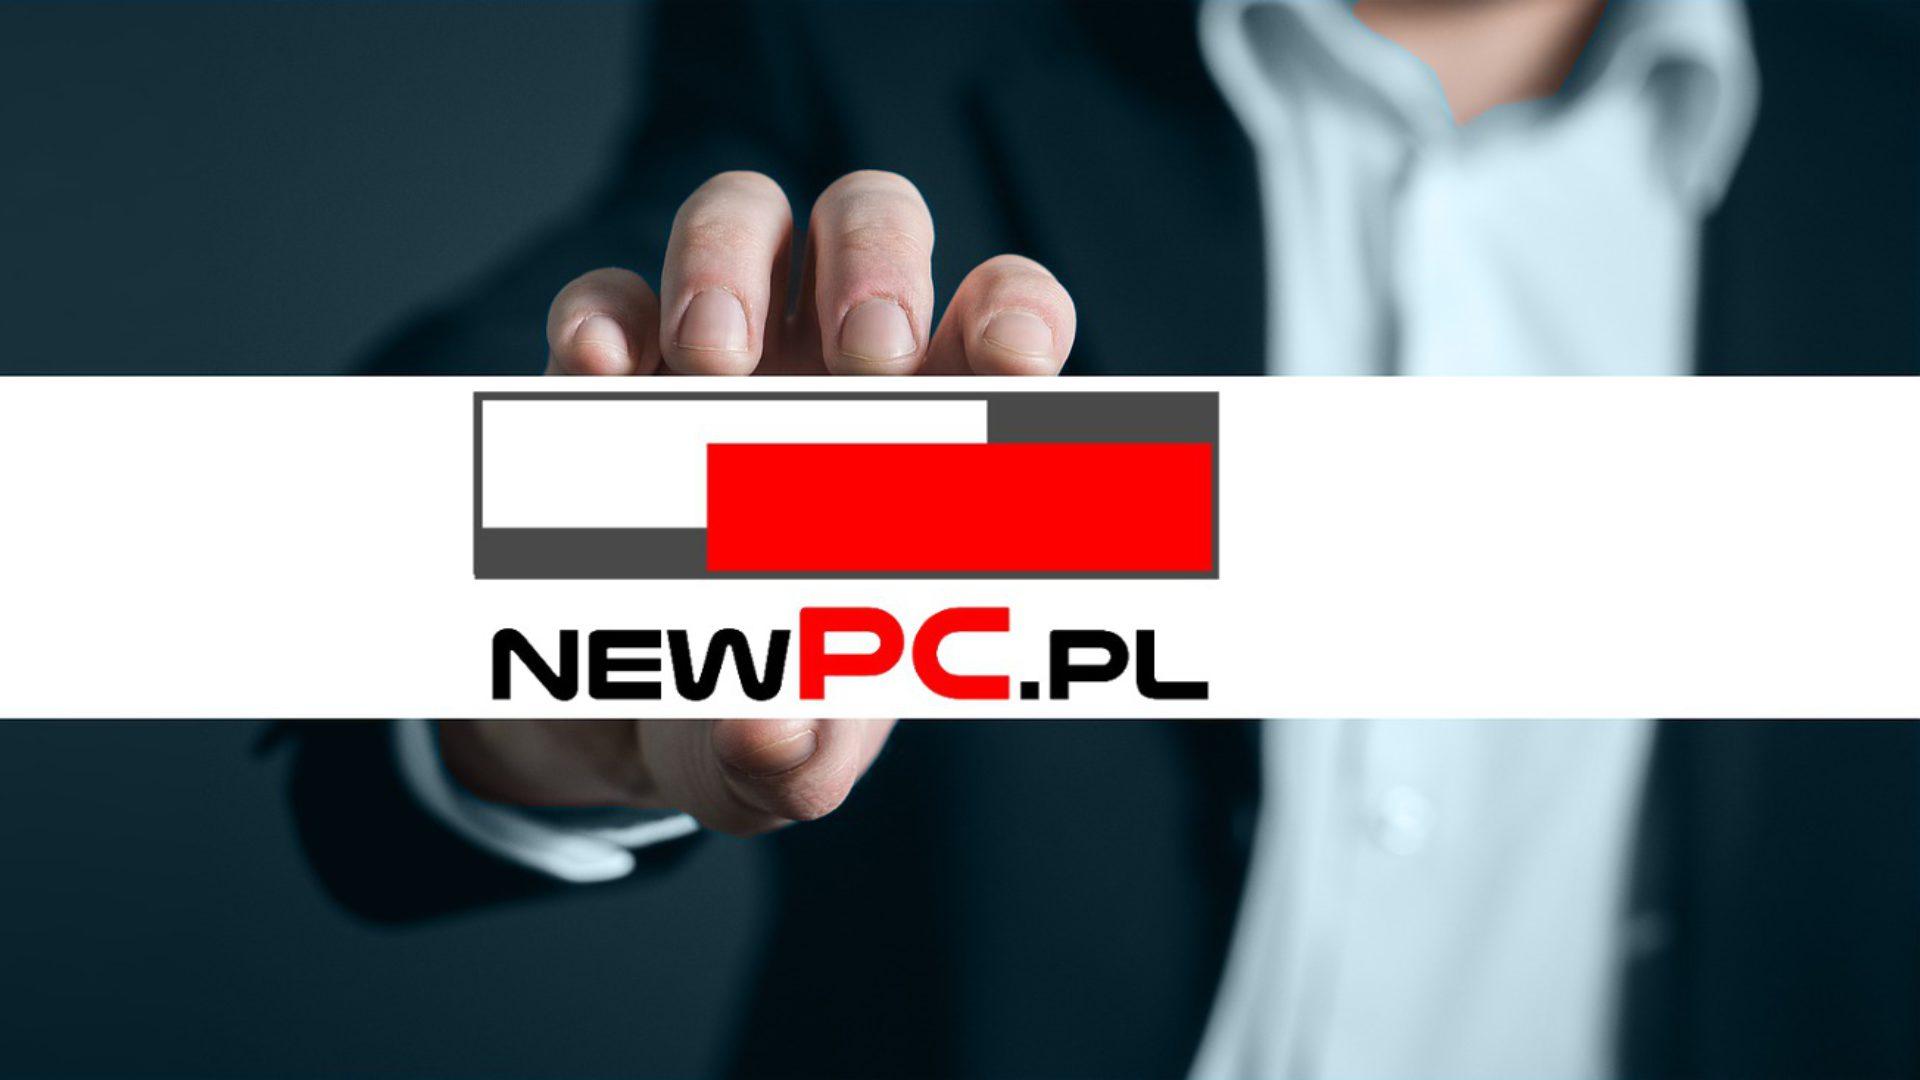 newPC.pl tel. 888-331-666